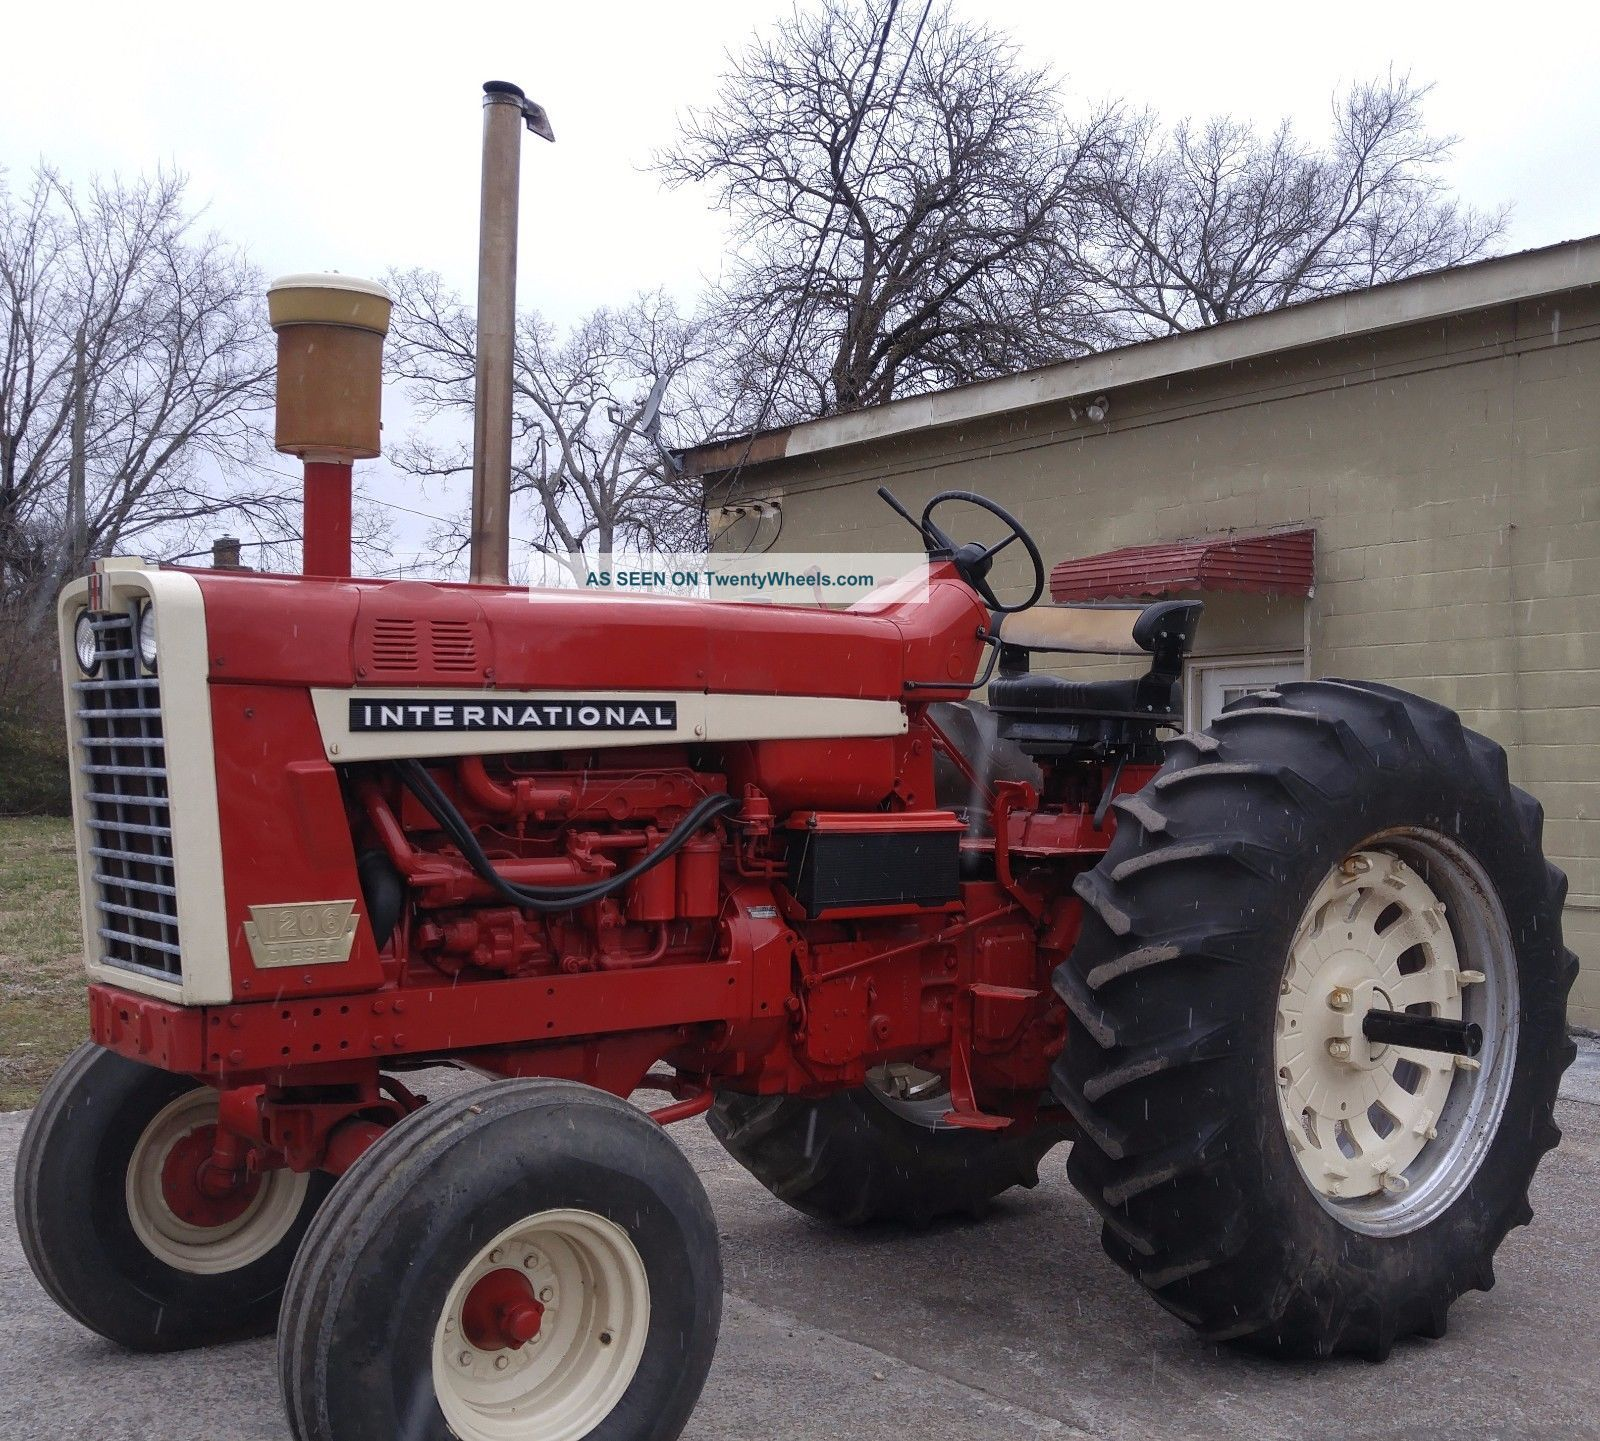 Ih 856 Tractor : International standard wheatland diesel tractor ih